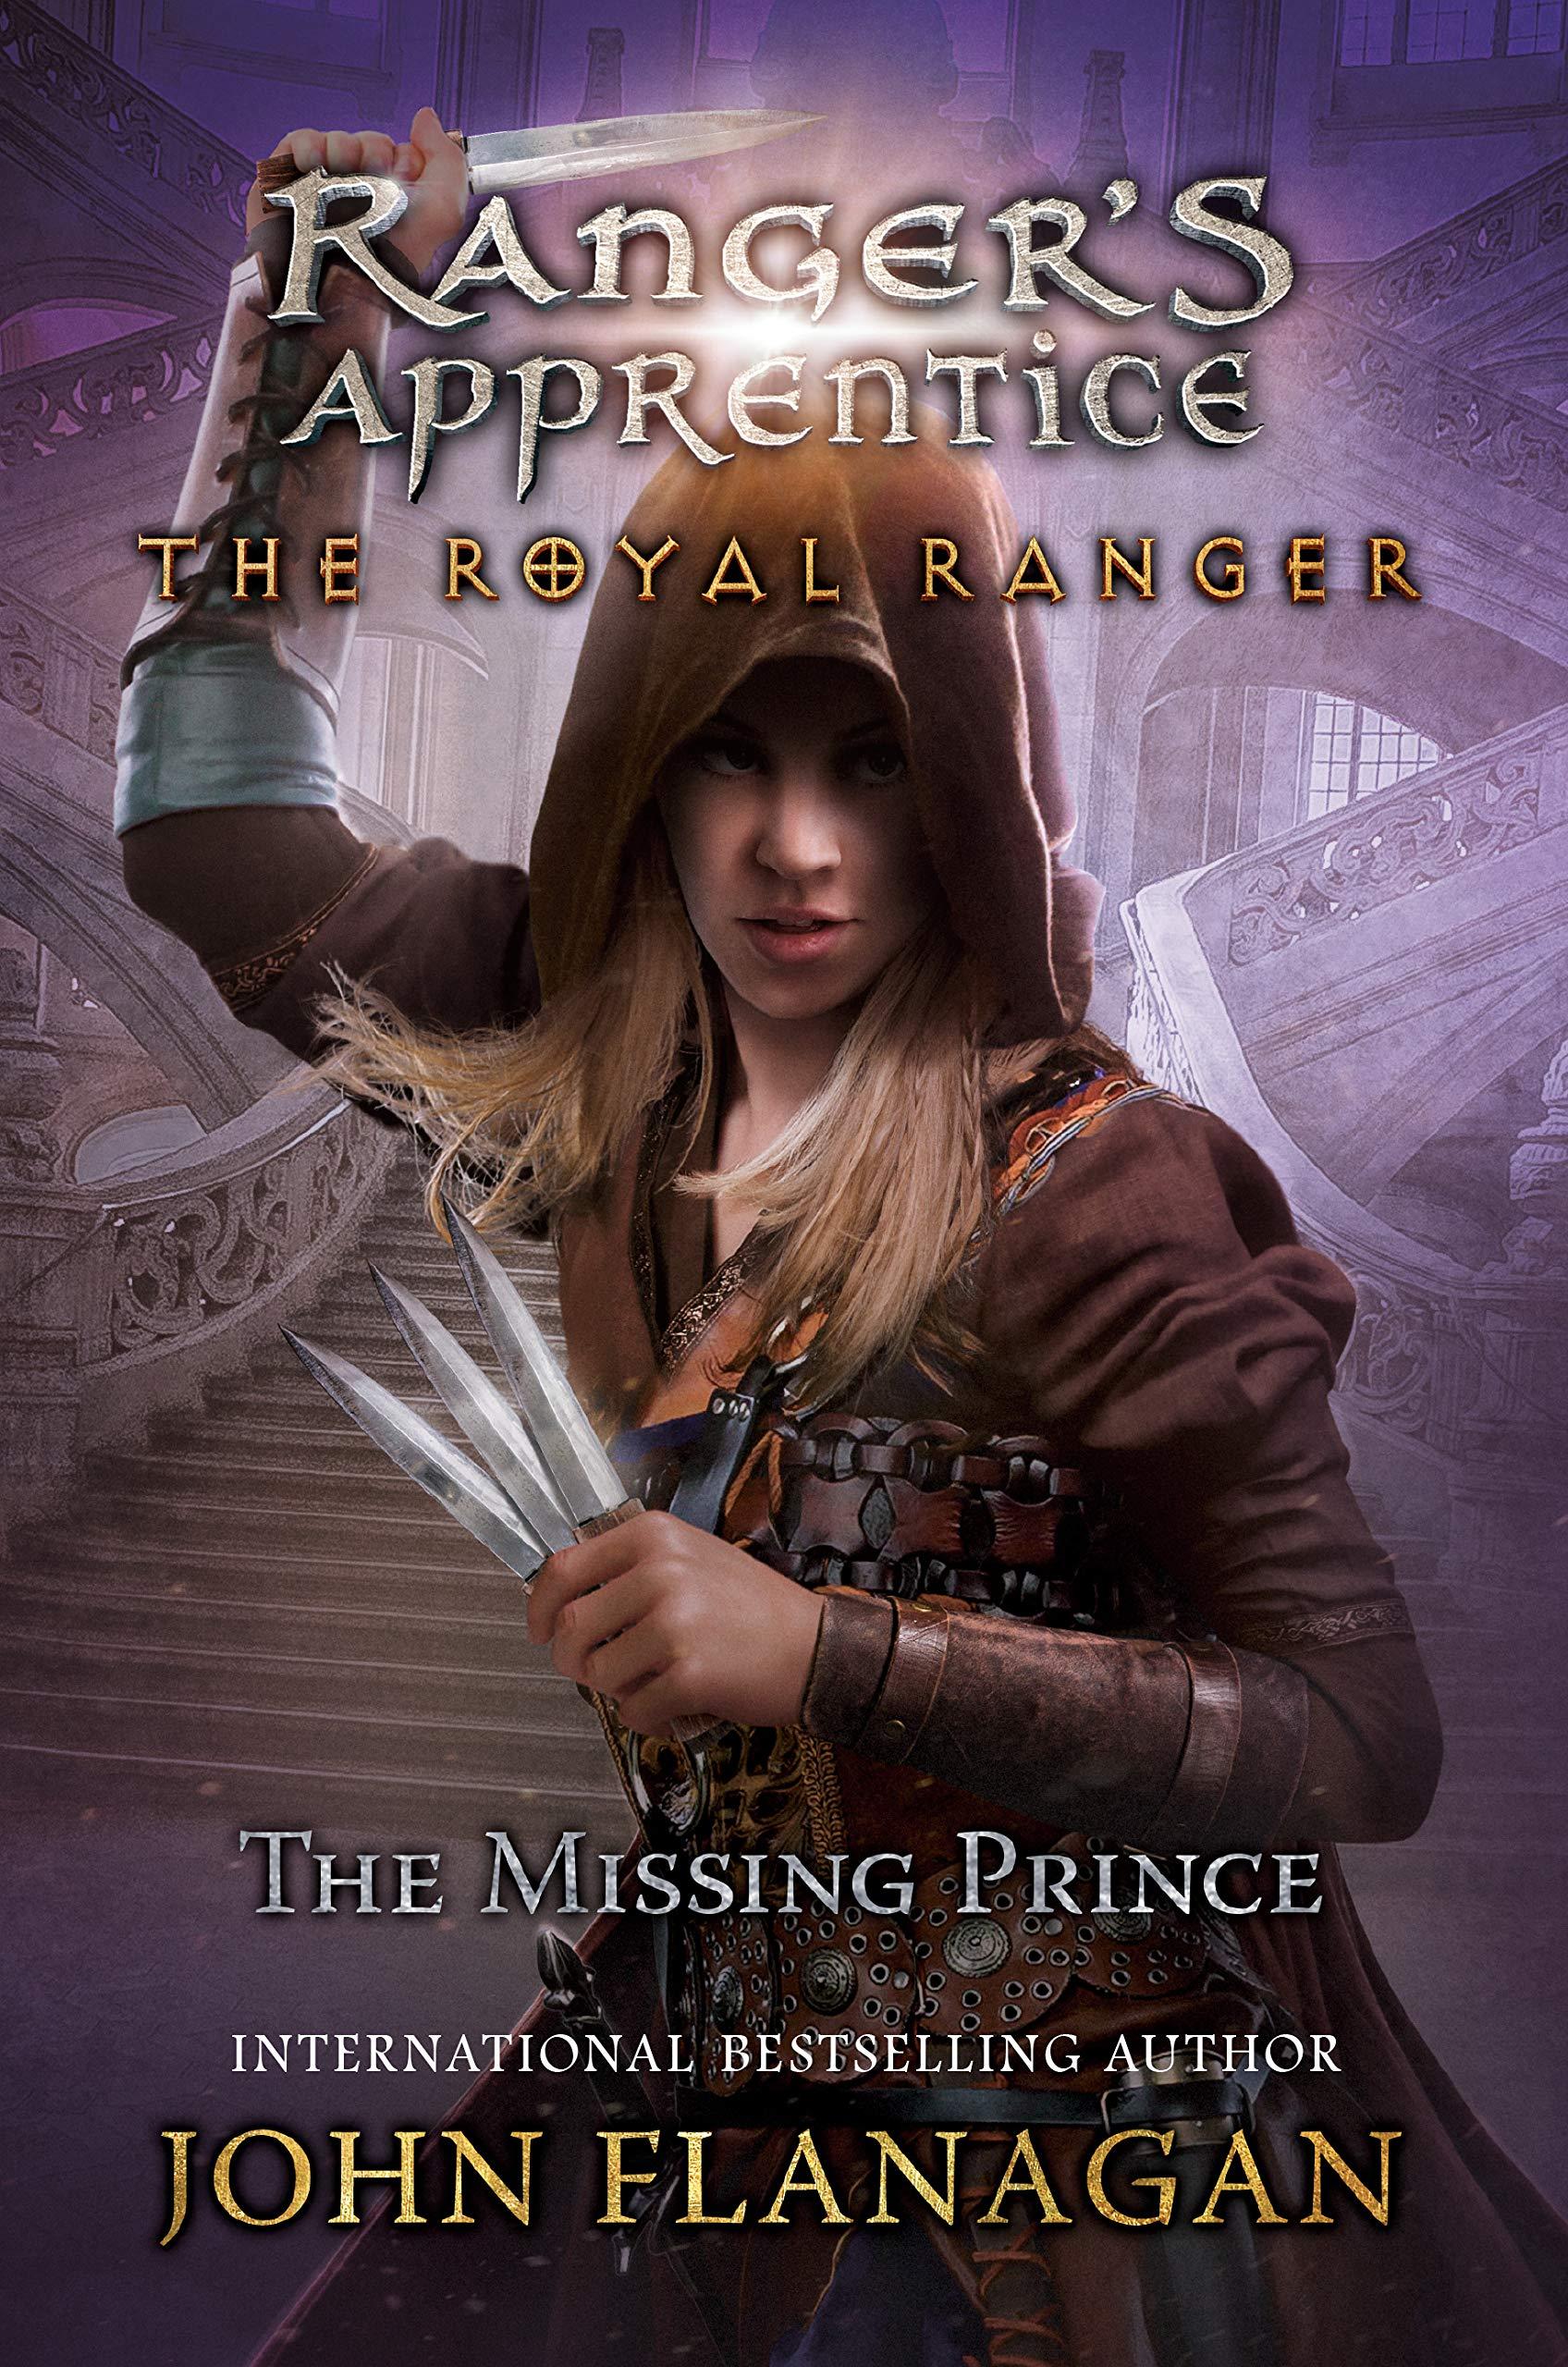 Ranger's Apprentice: The Missing Prince - John Flanagan